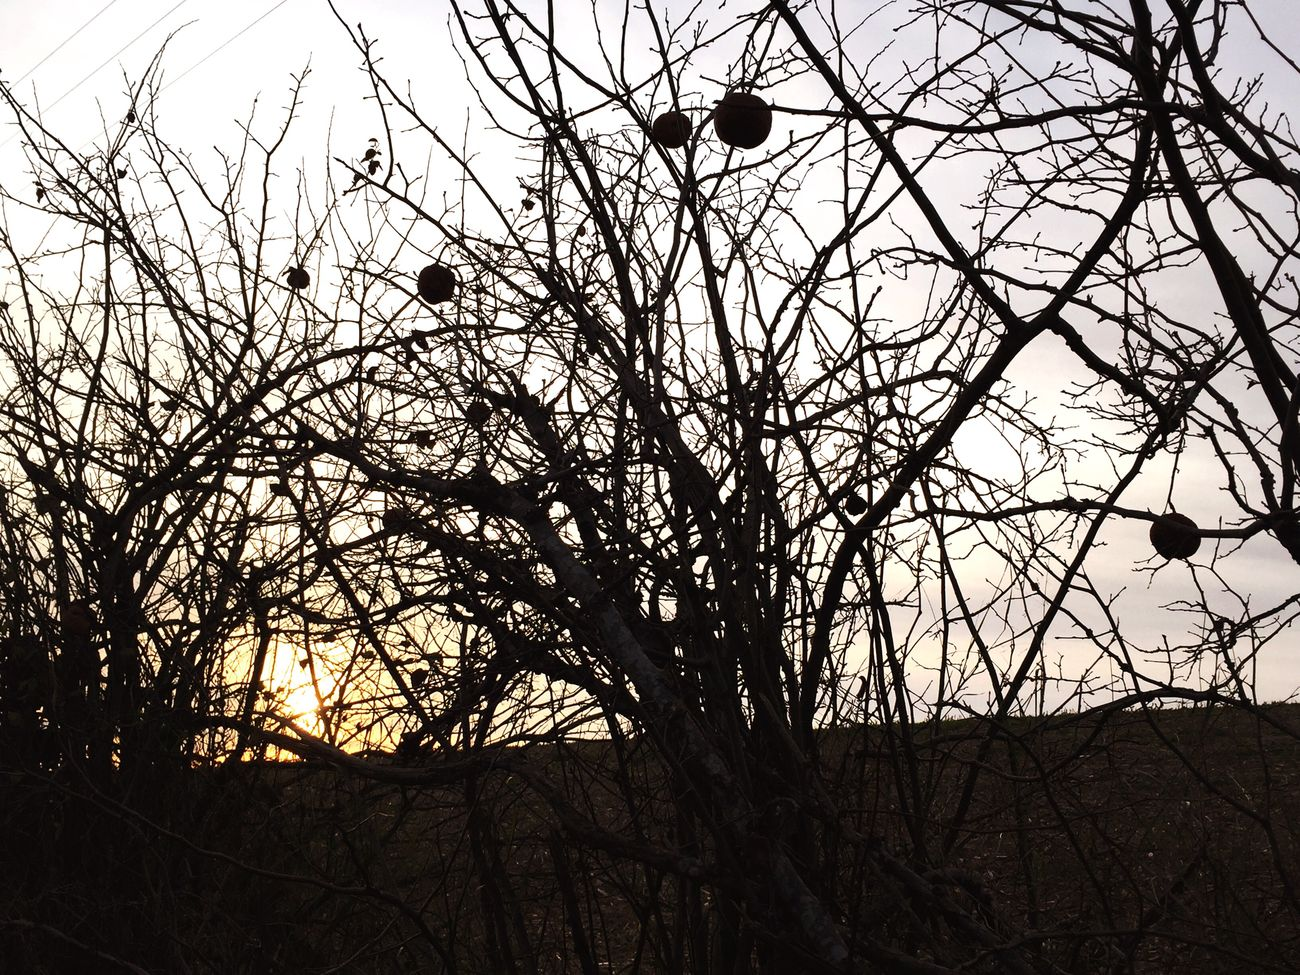 Nostalgia 🌾✨ Melancholic Landscapes Melancholy Sunset Tree Branches Sun Landscape Landscape_photography Nature Nature Photography EyeEm Nature Lover EyeEm Best Shots - Nature